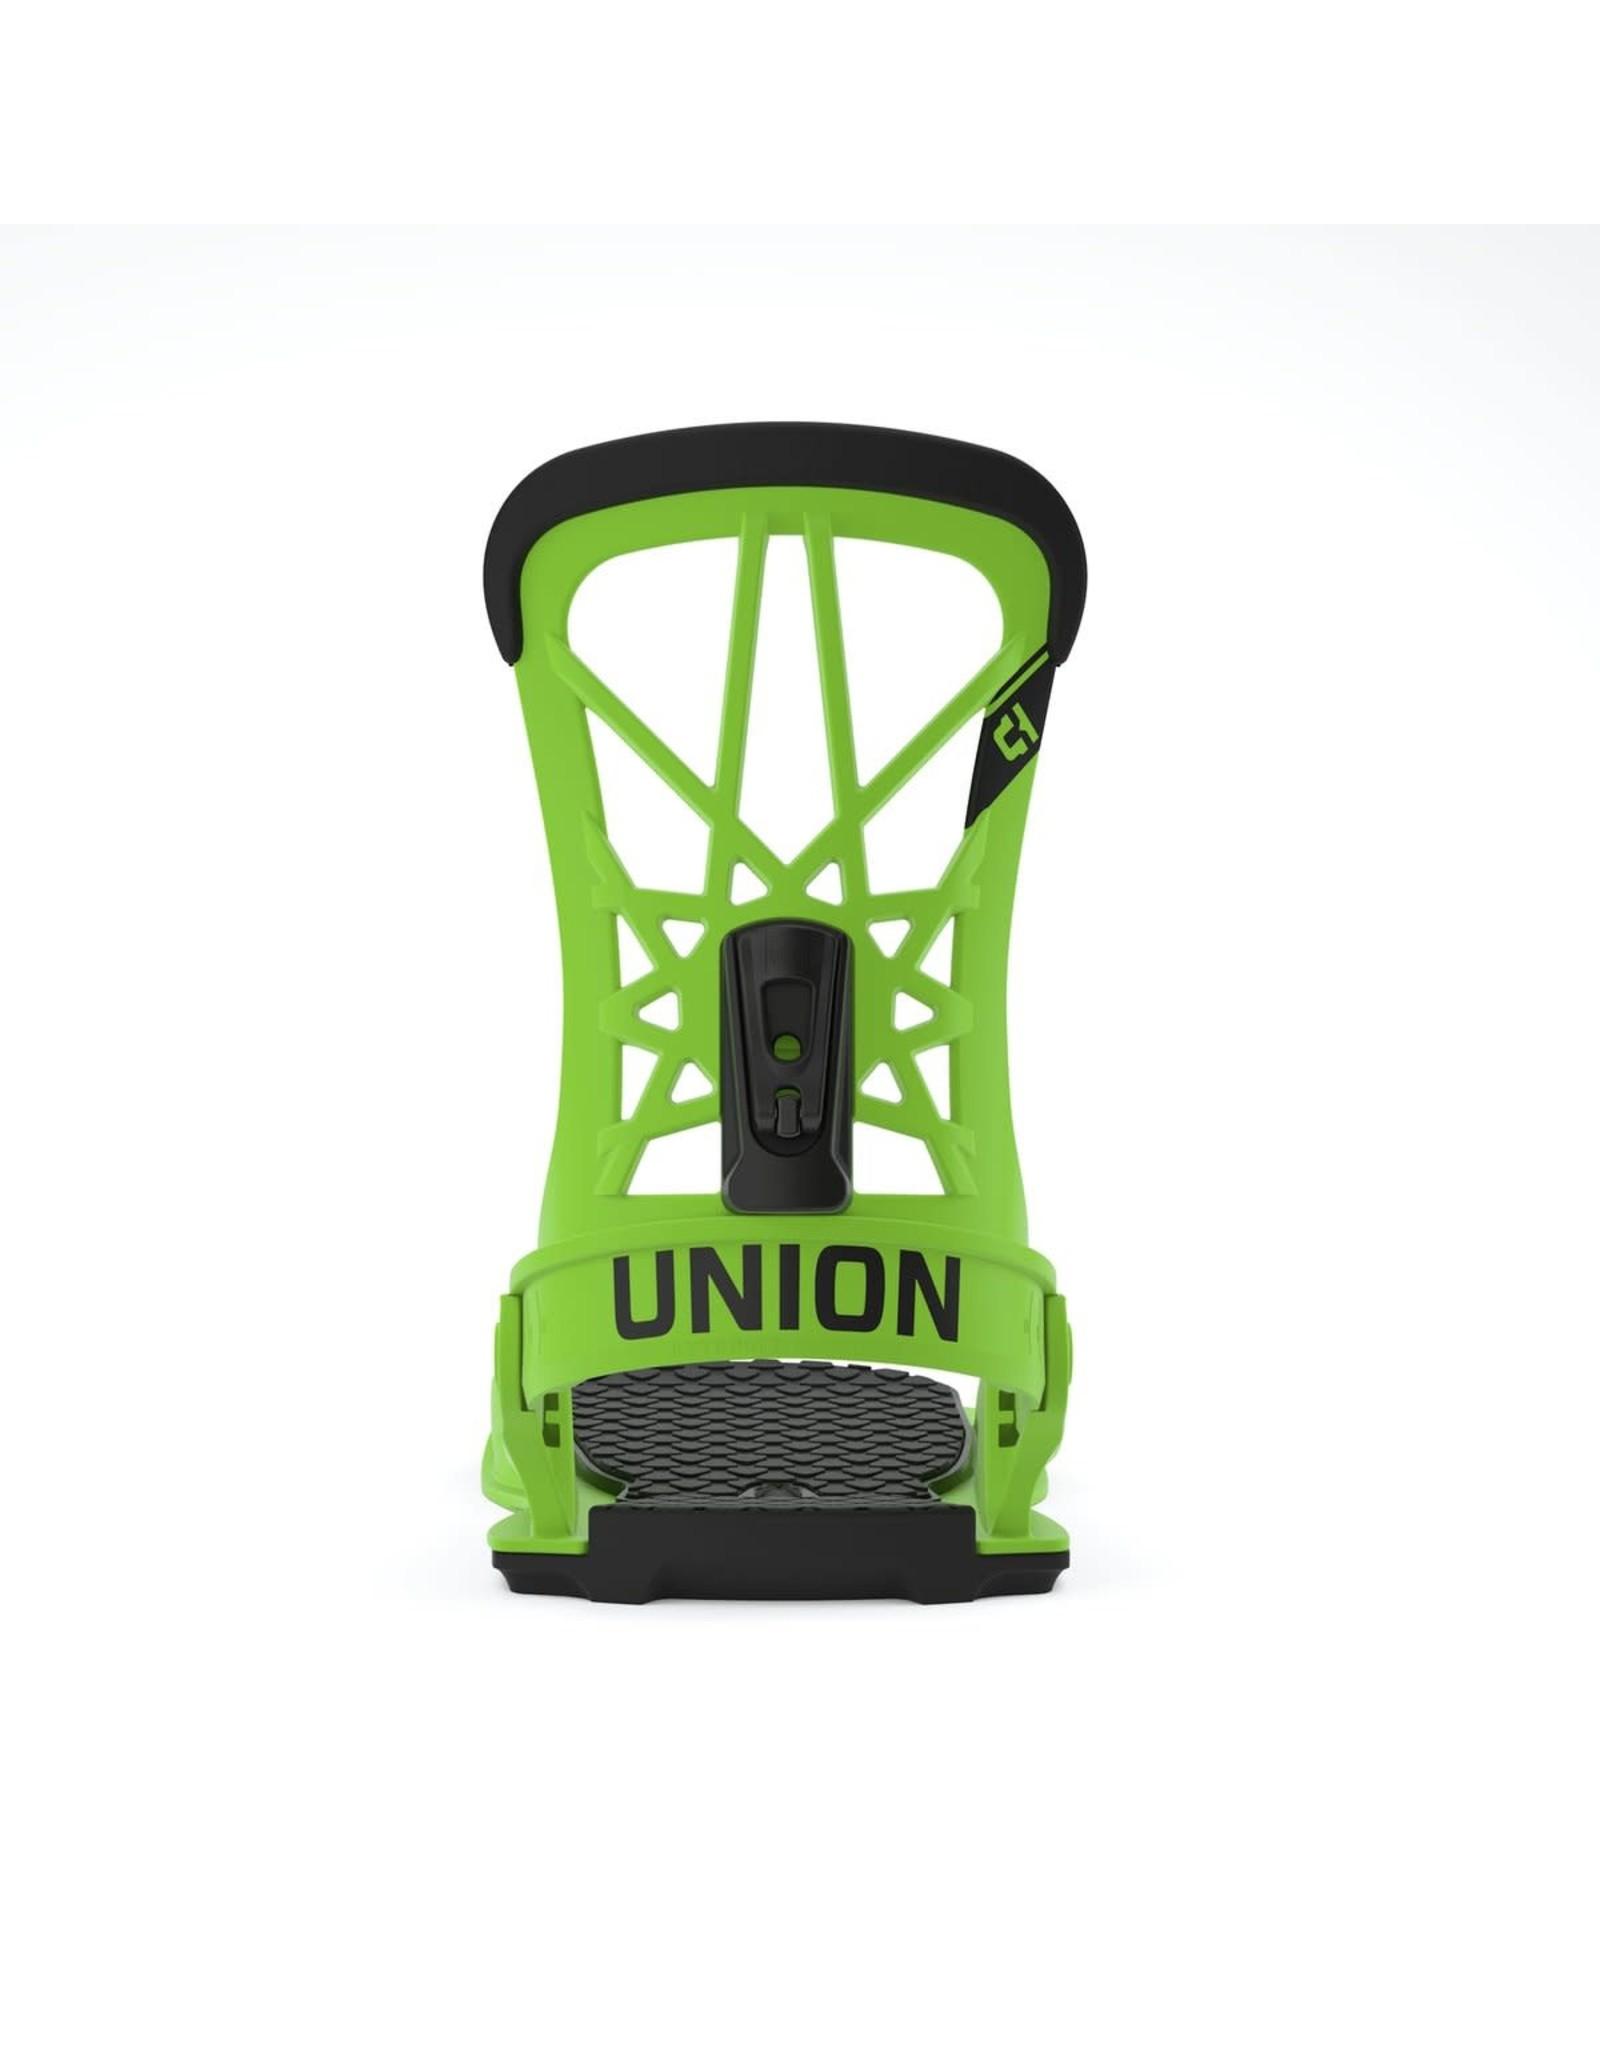 union Union - fixation flite  pro